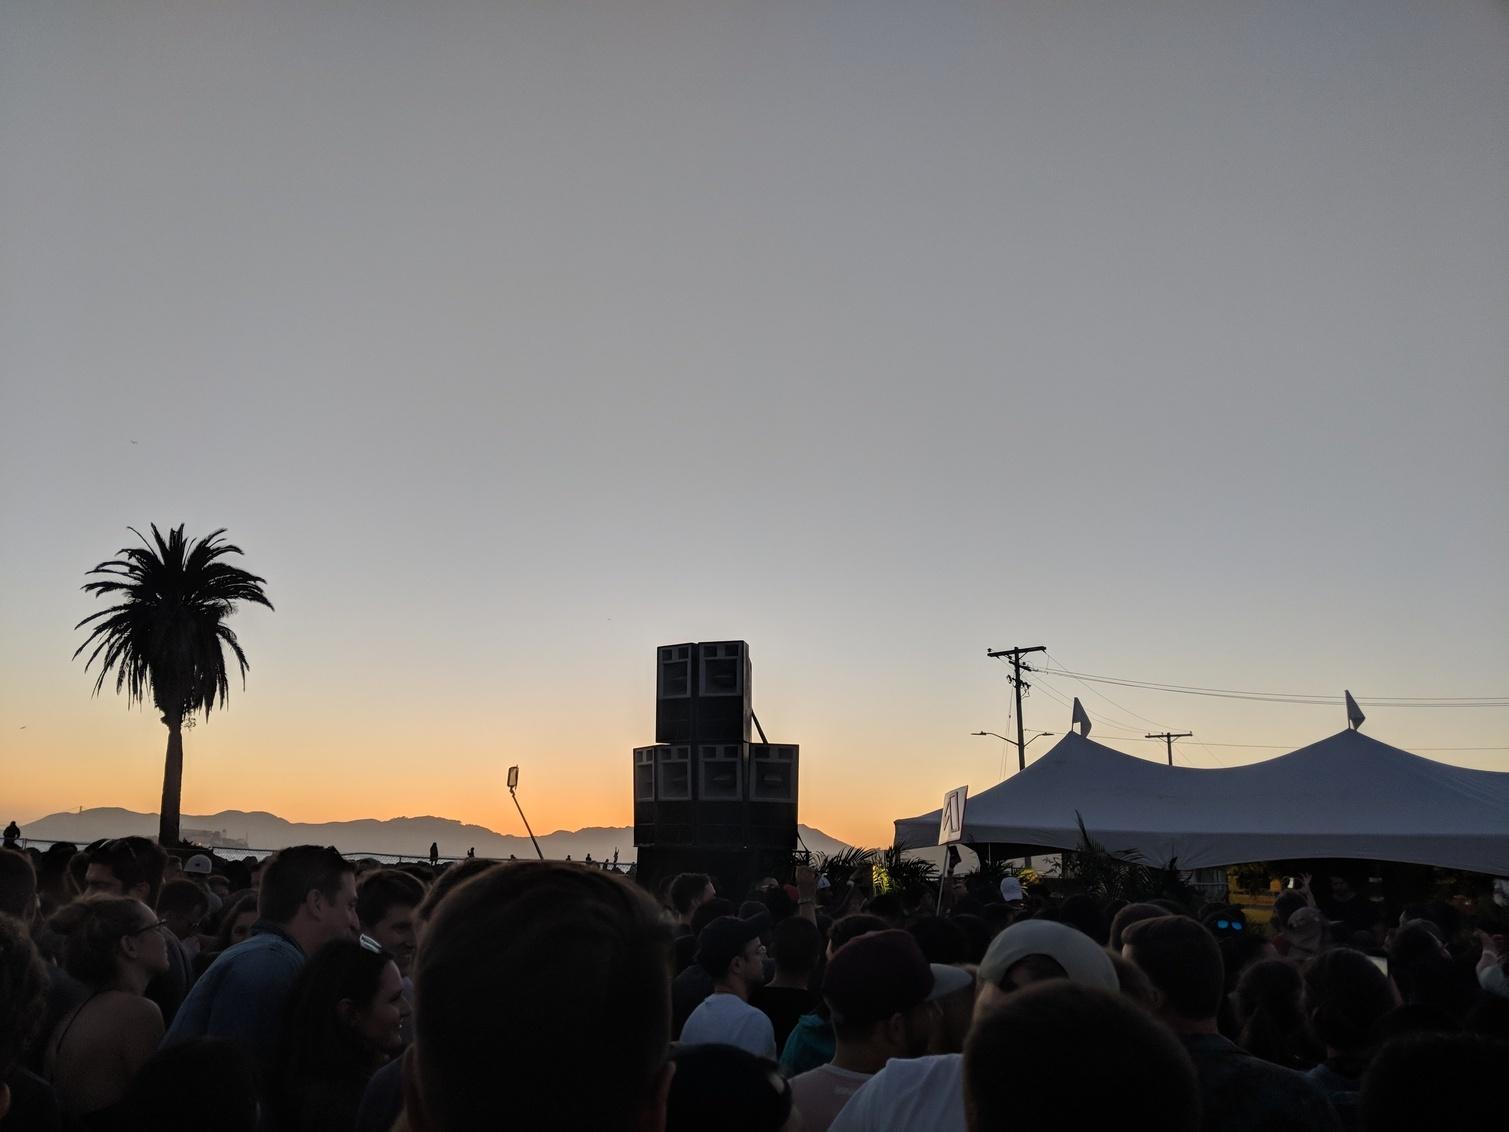 Anjunadeep Open Air San Francisco - August 2018